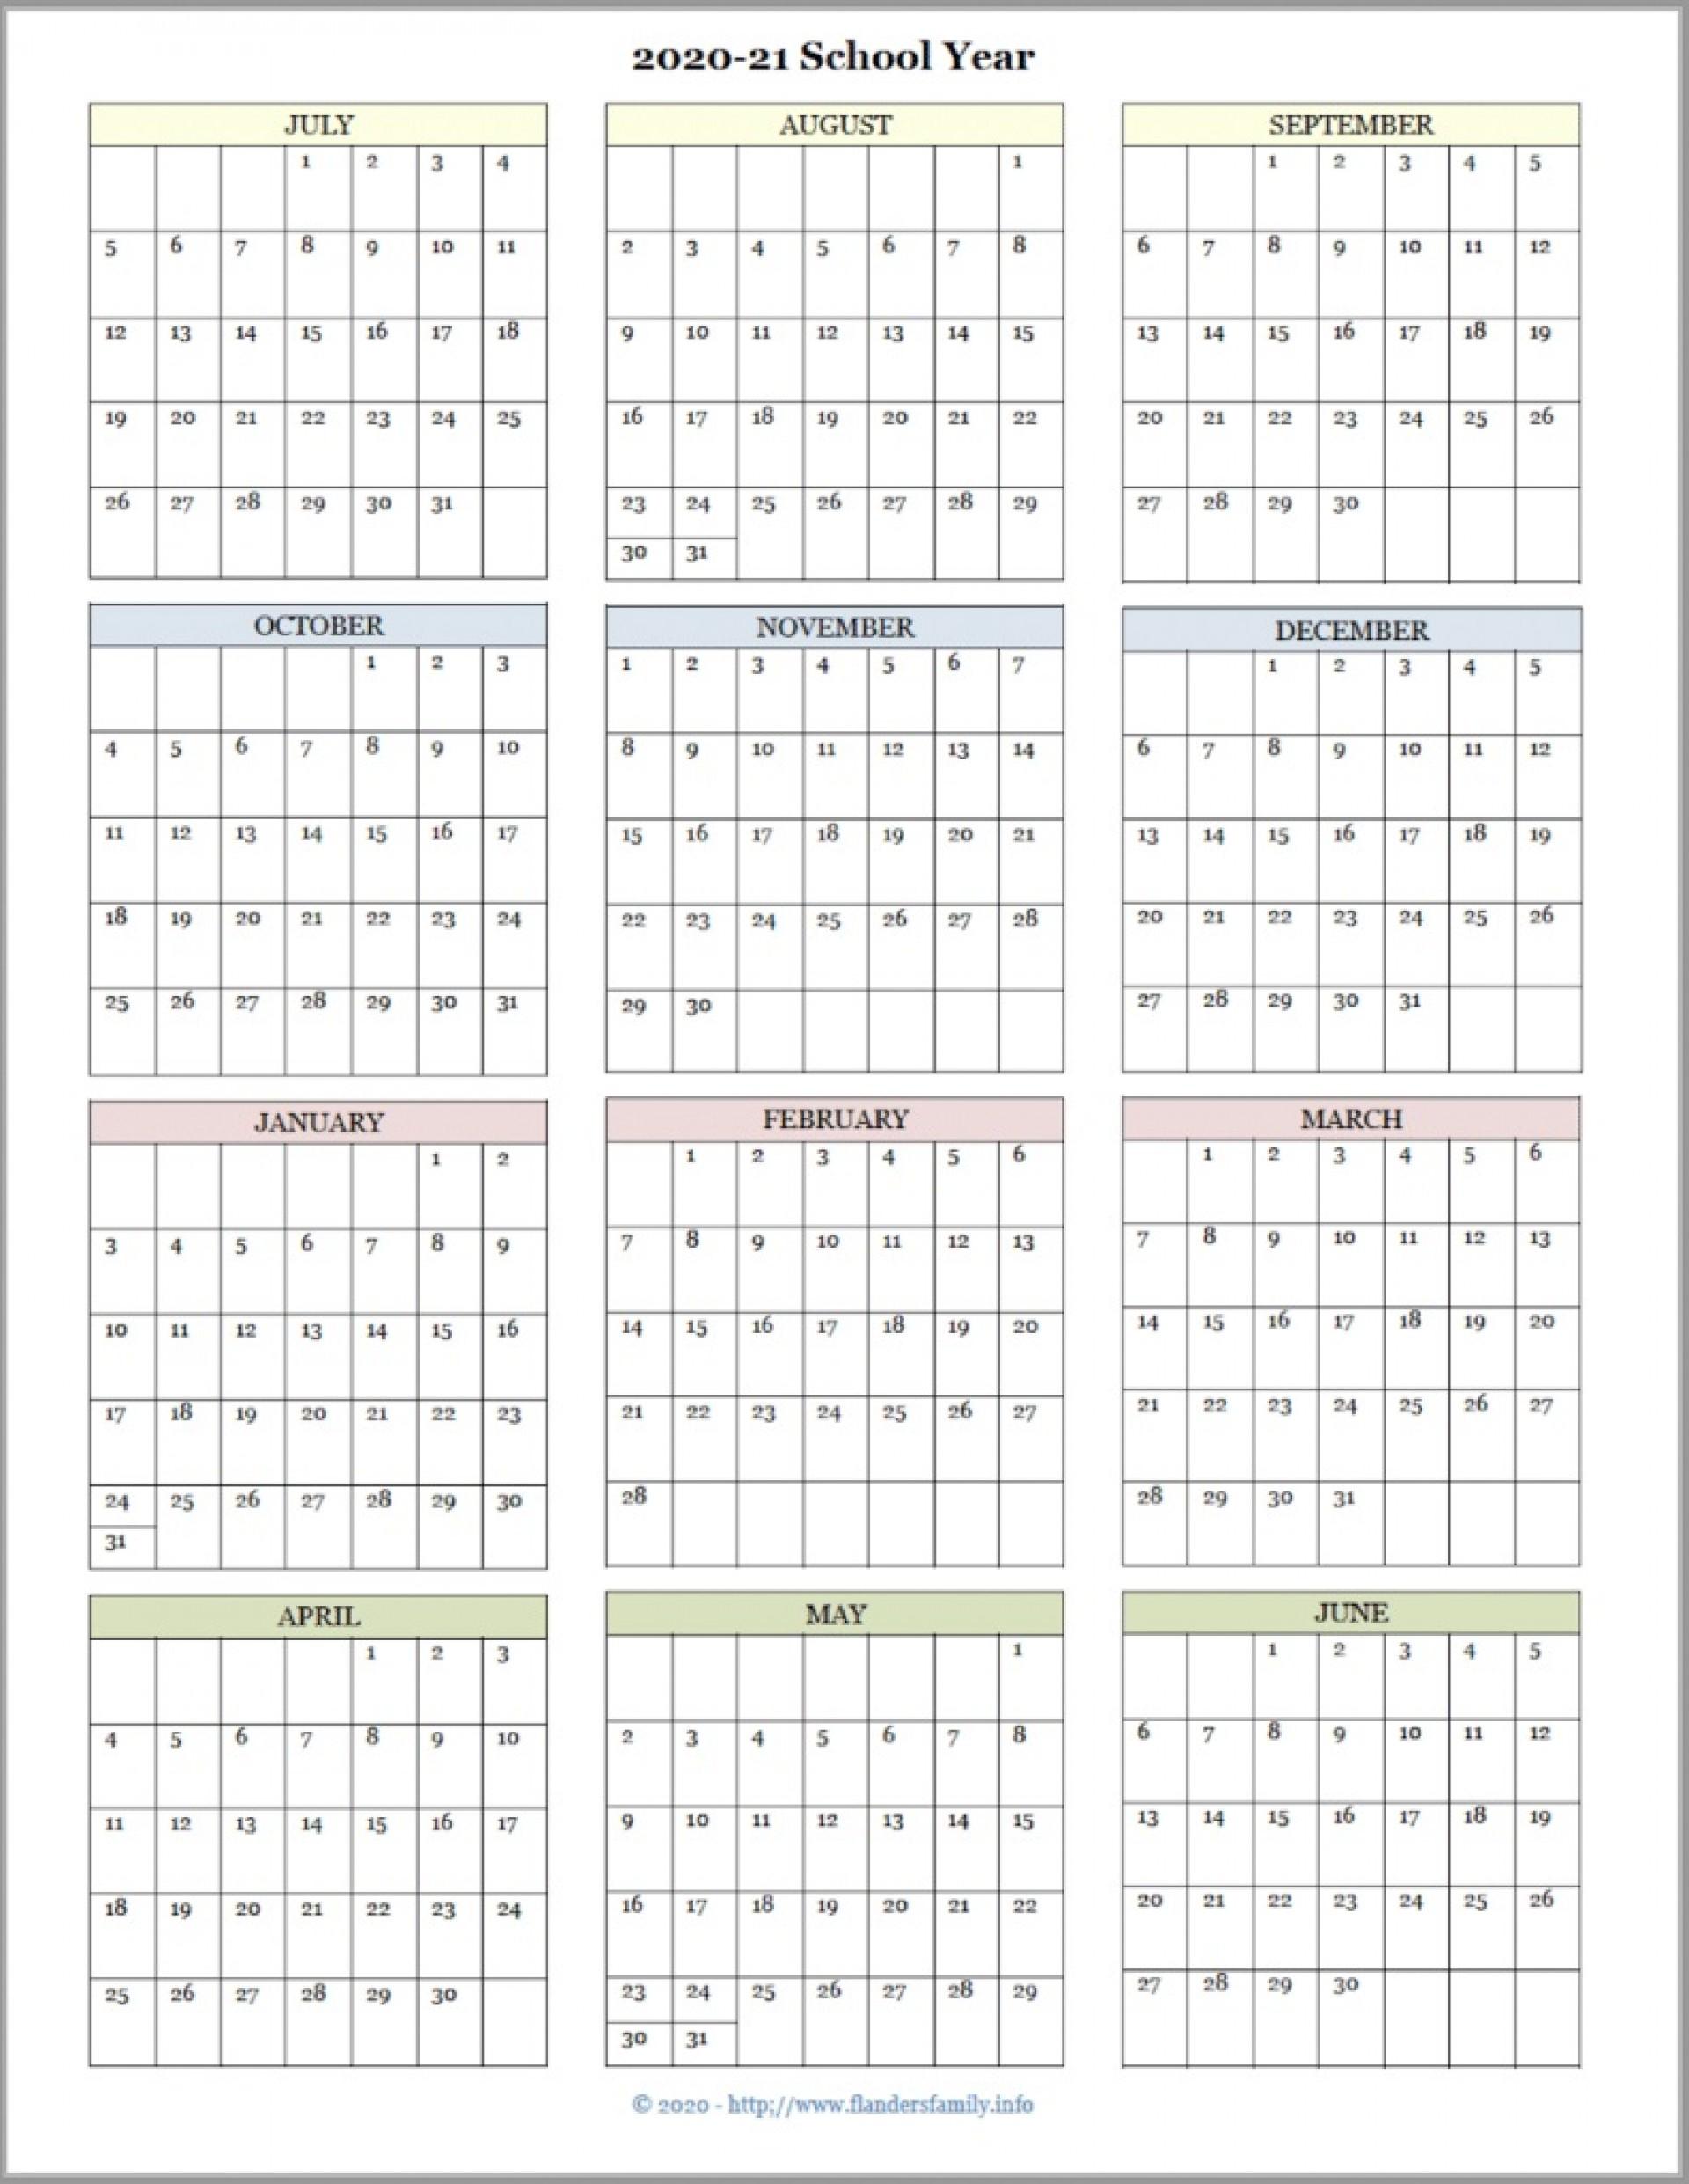 001 Formidable School Year Calendar Template Idea  Excel 2019-20 Word1920